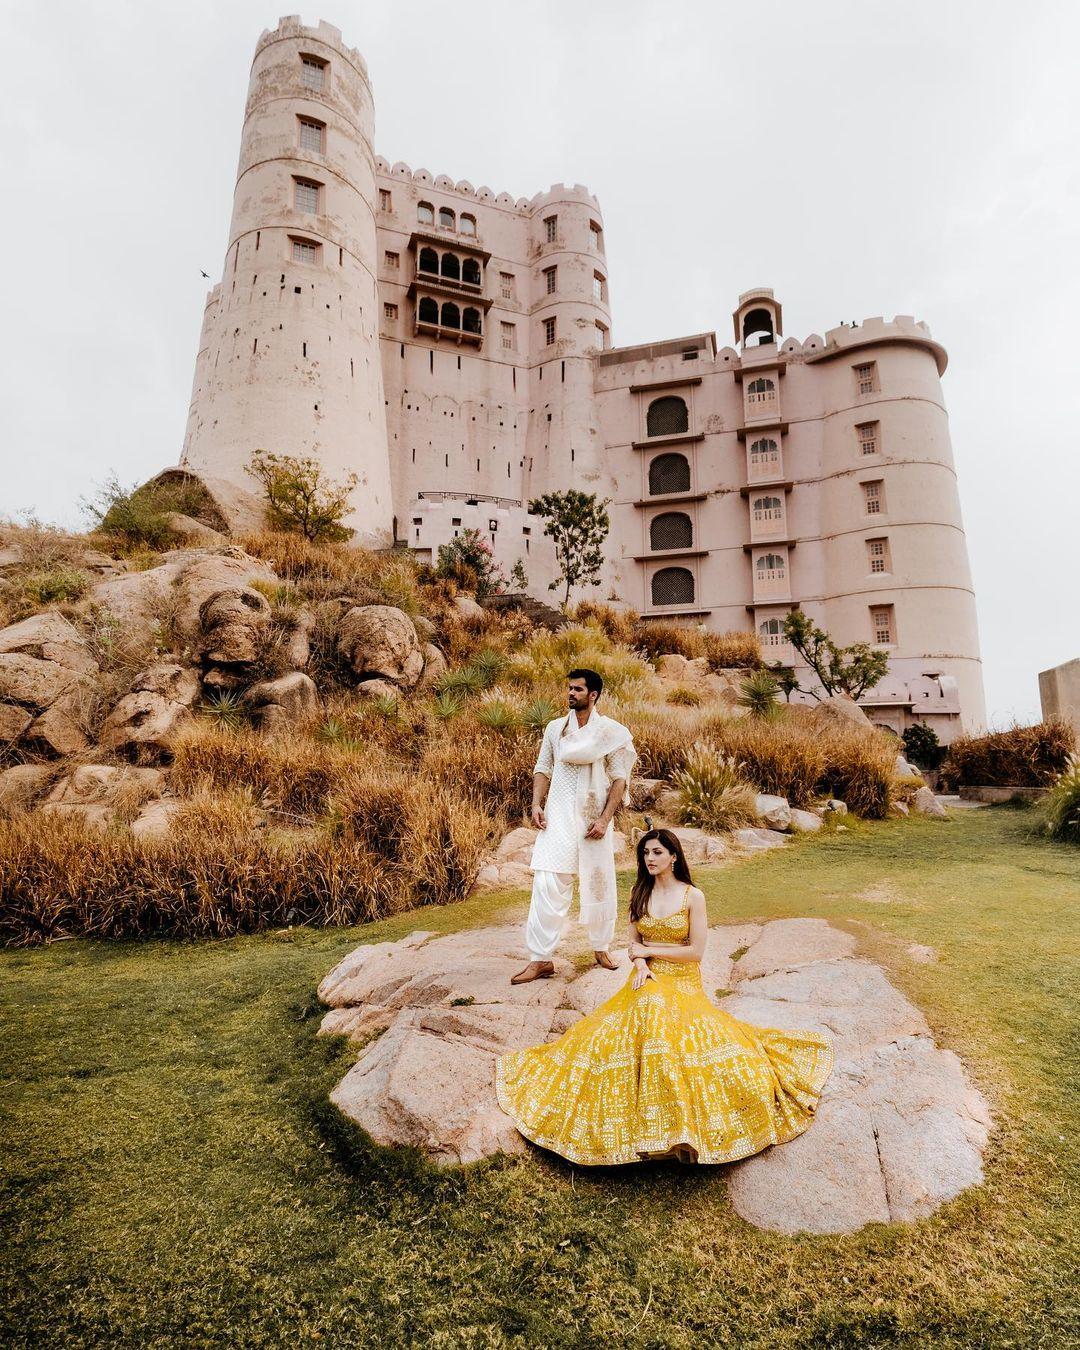 pre-wedding phot shoot